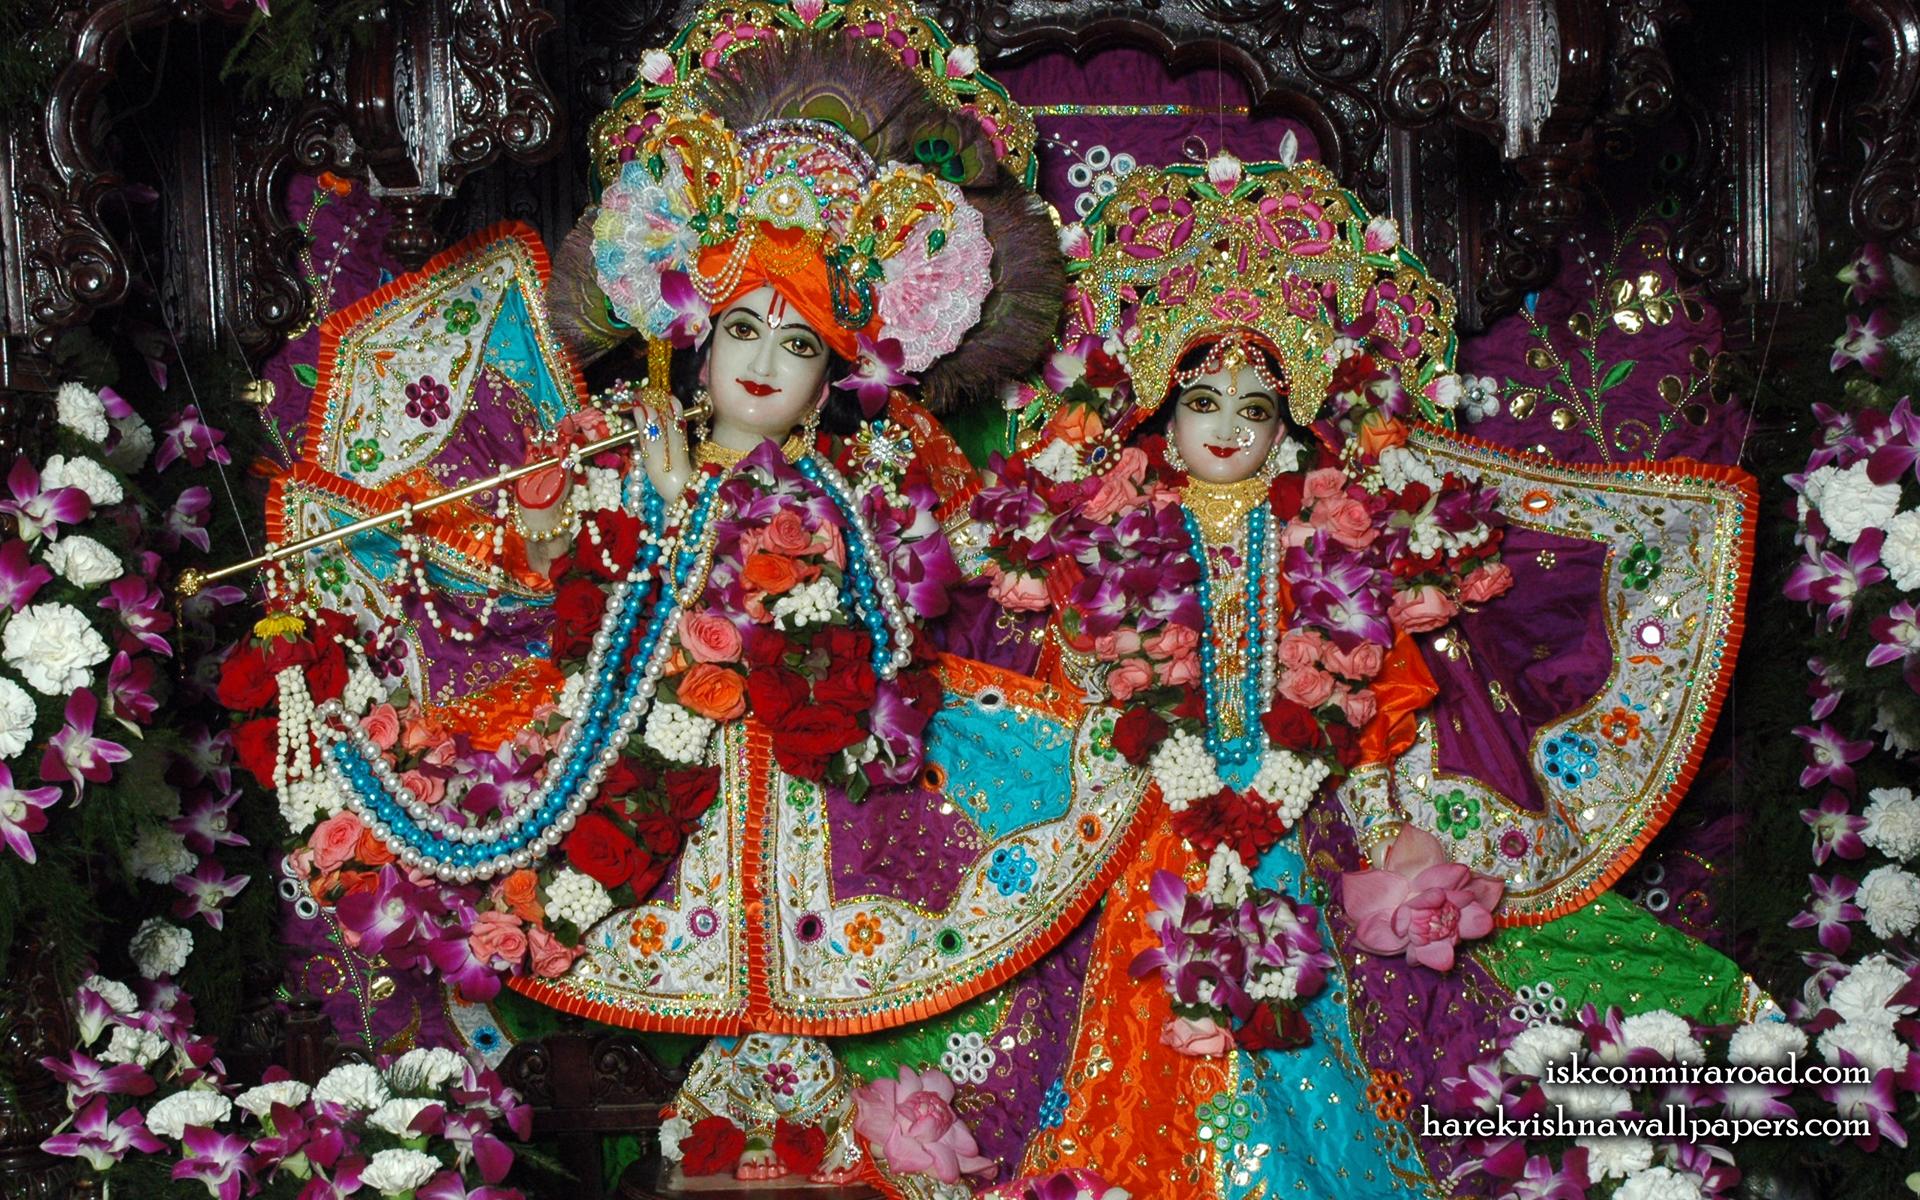 Sri Sri Radha Giridhari Wallpaper (016) Size 1920x1200 Download